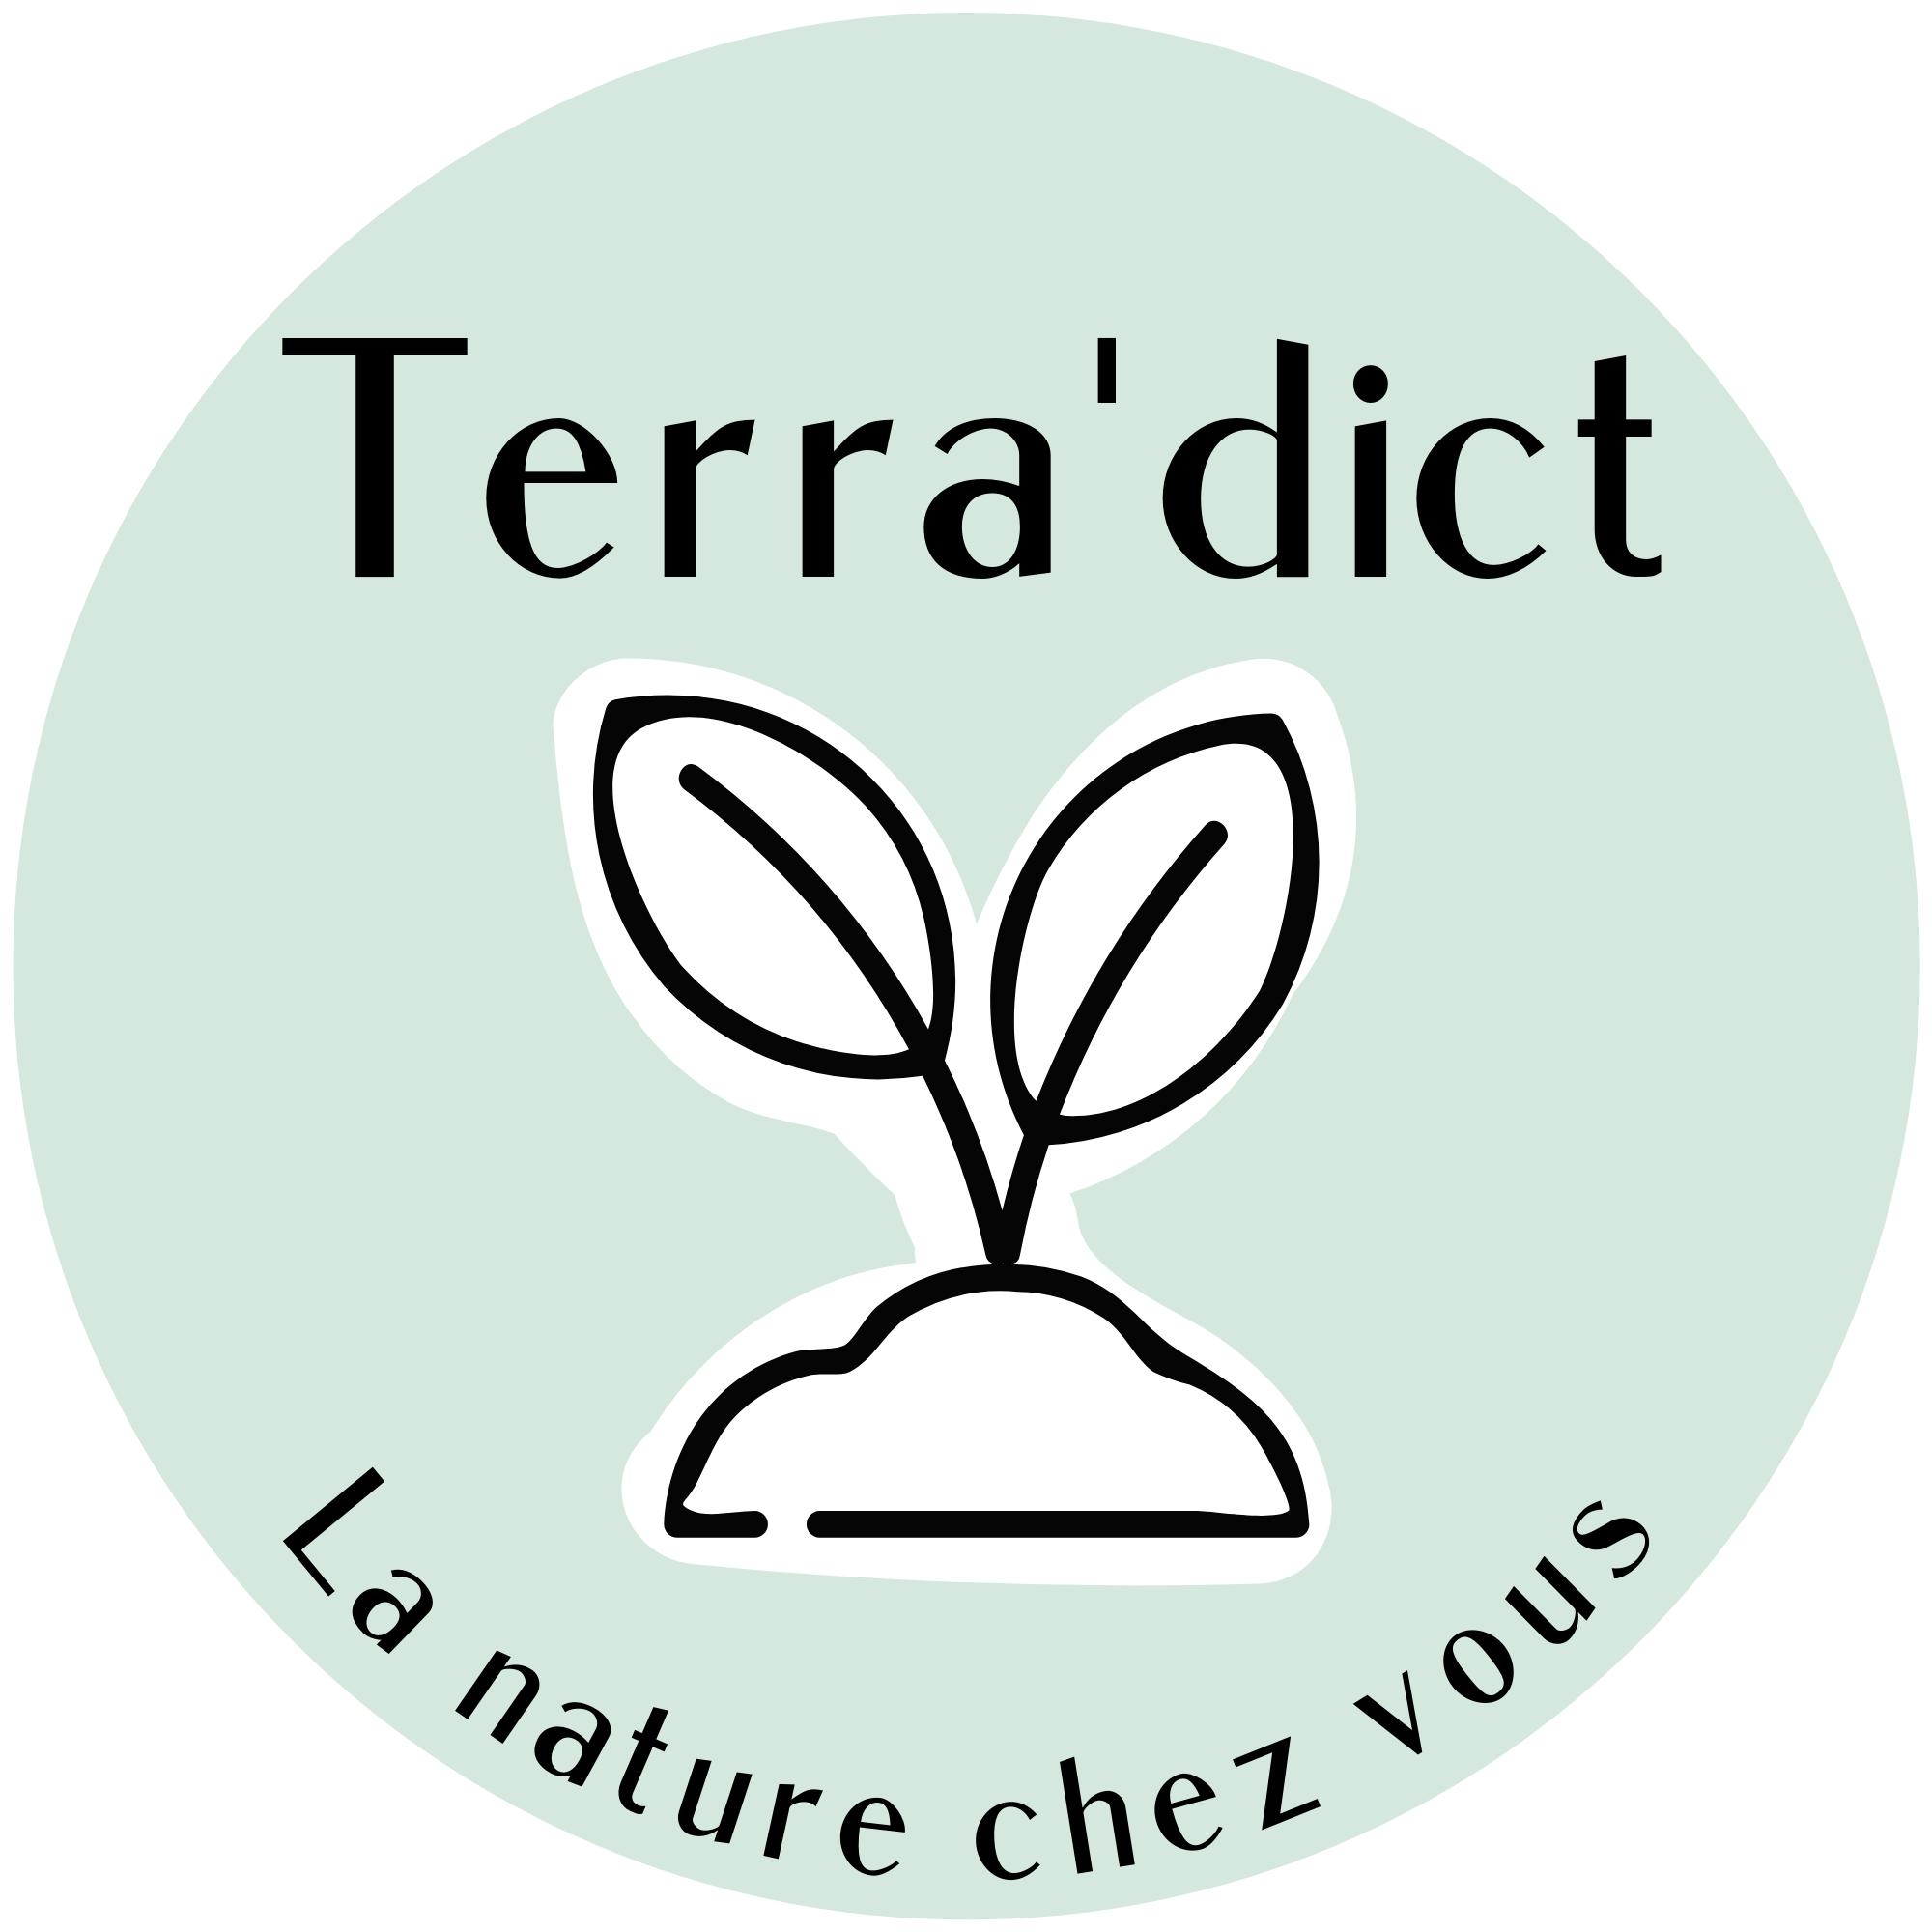 Terradict